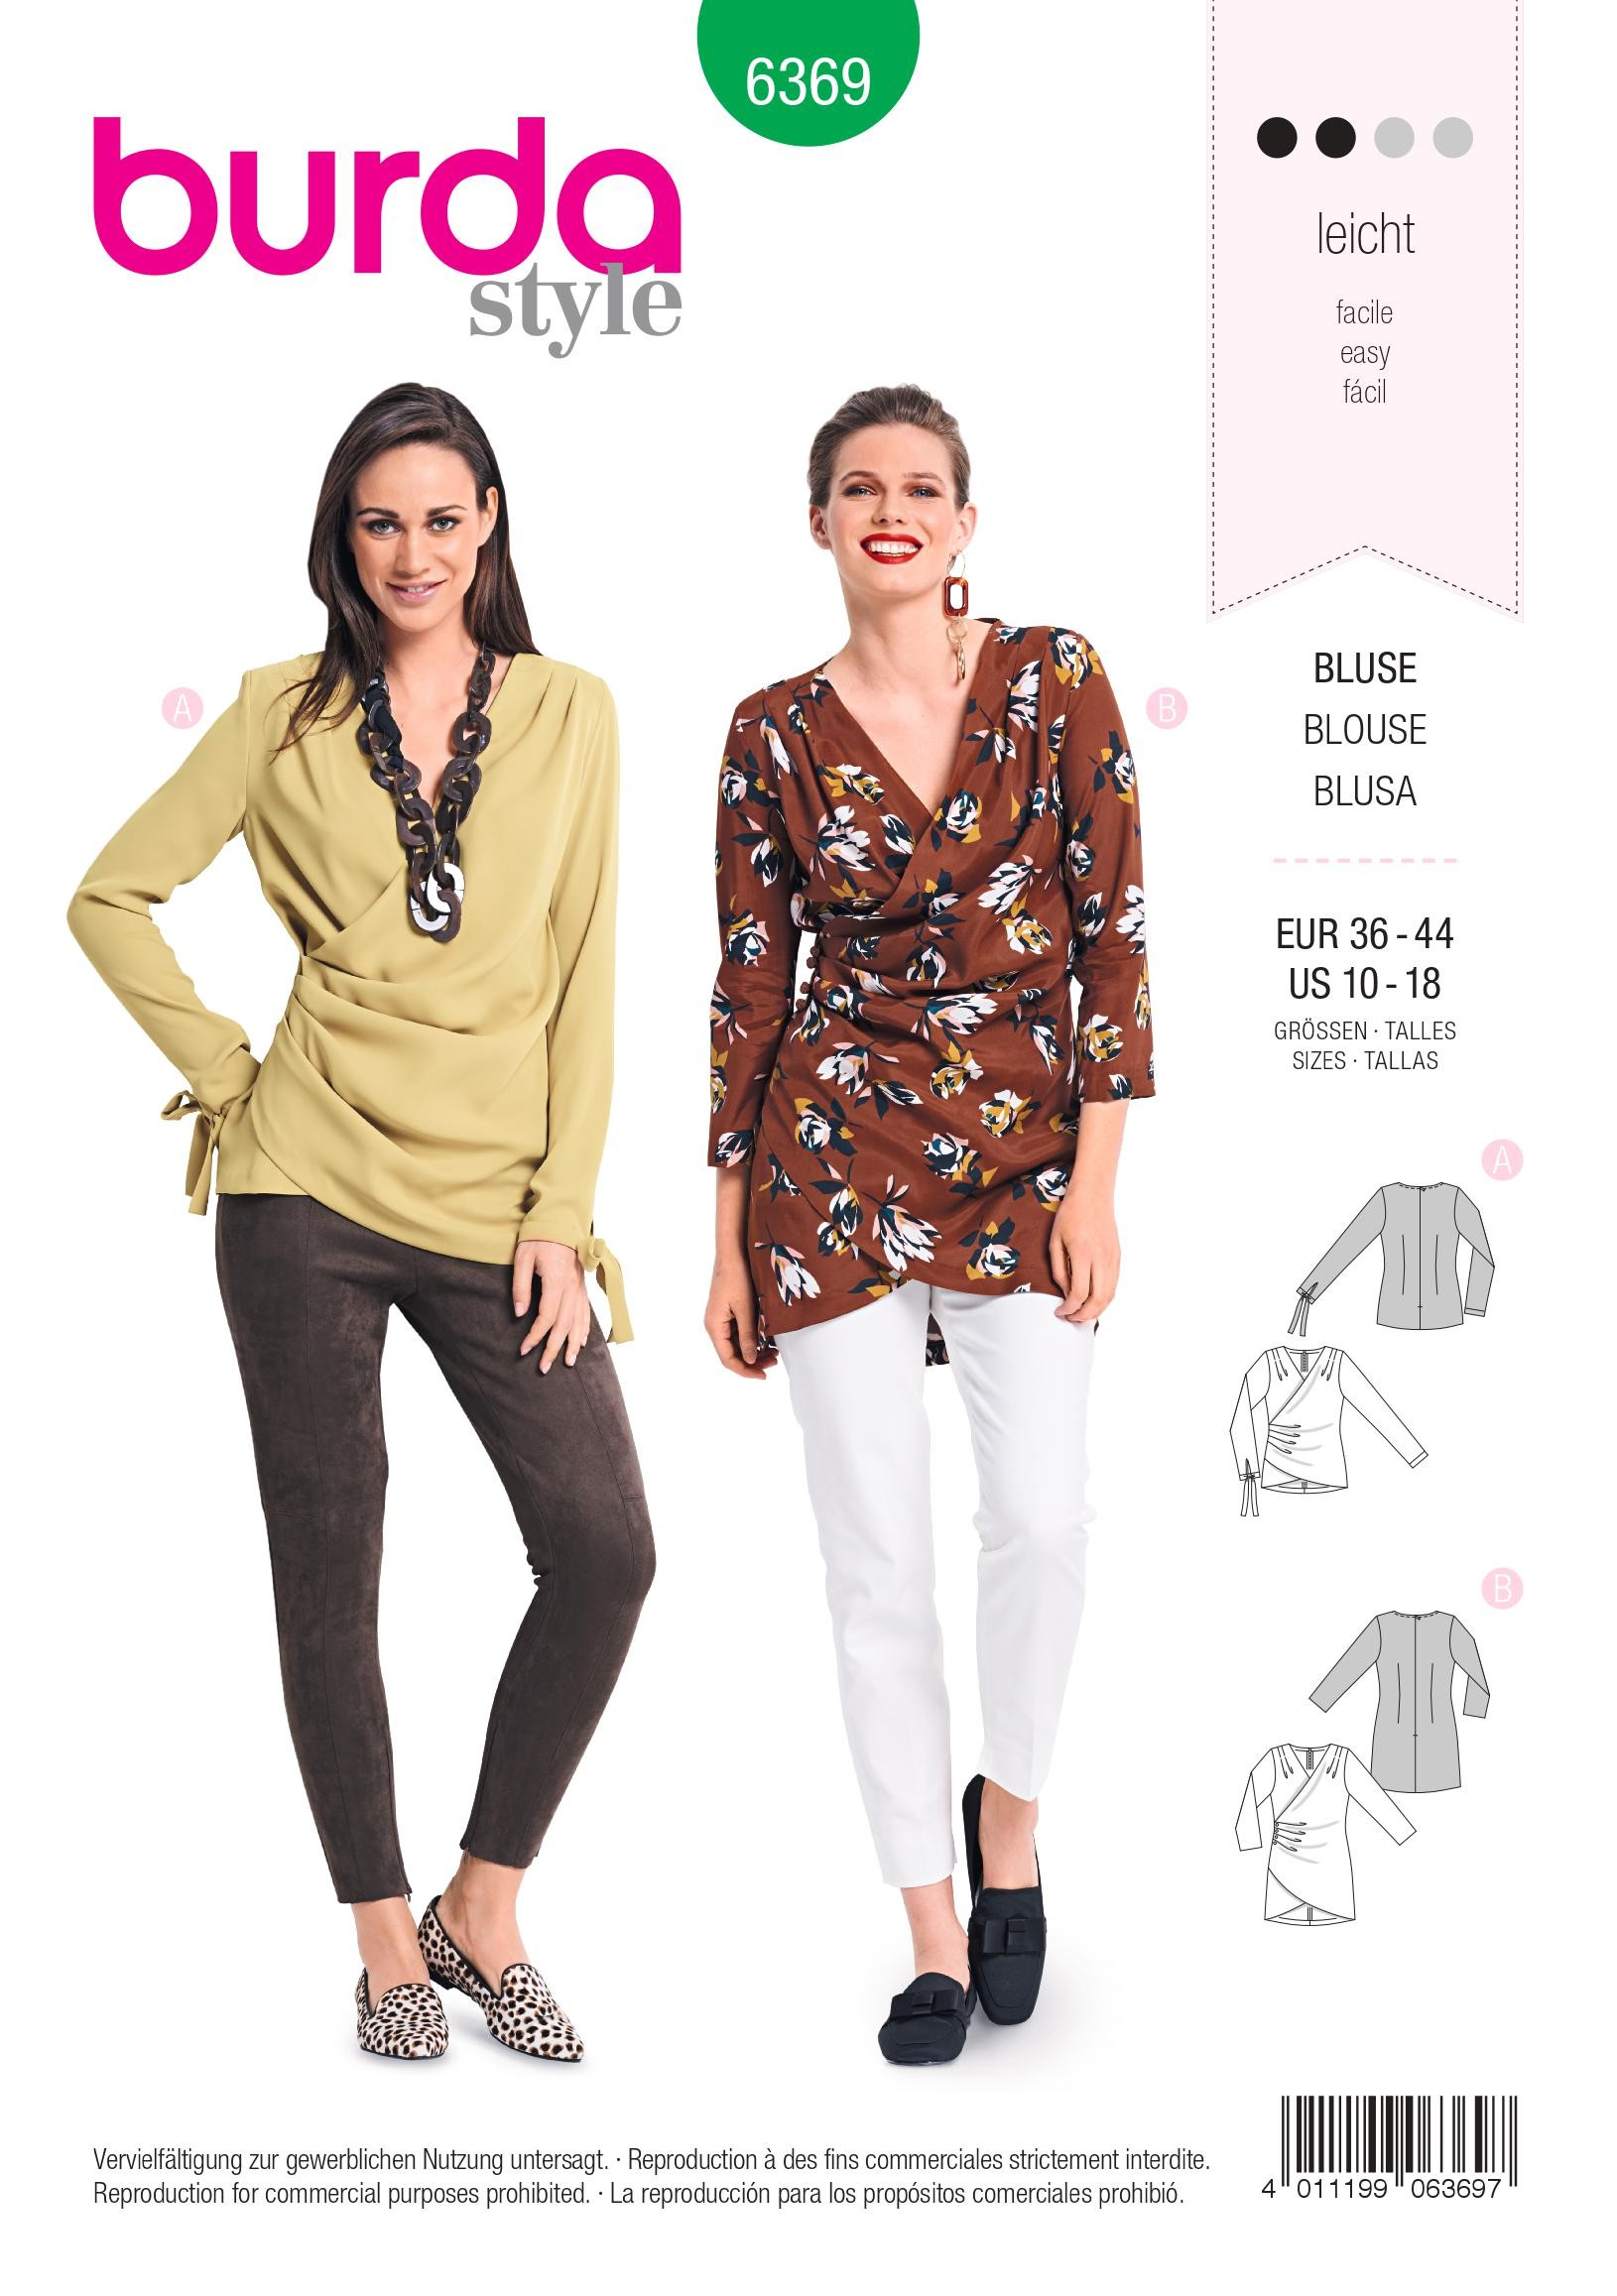 Burda Ladies Easy Sewing Pattern 6533 Blouse Tops Christmas Ornament